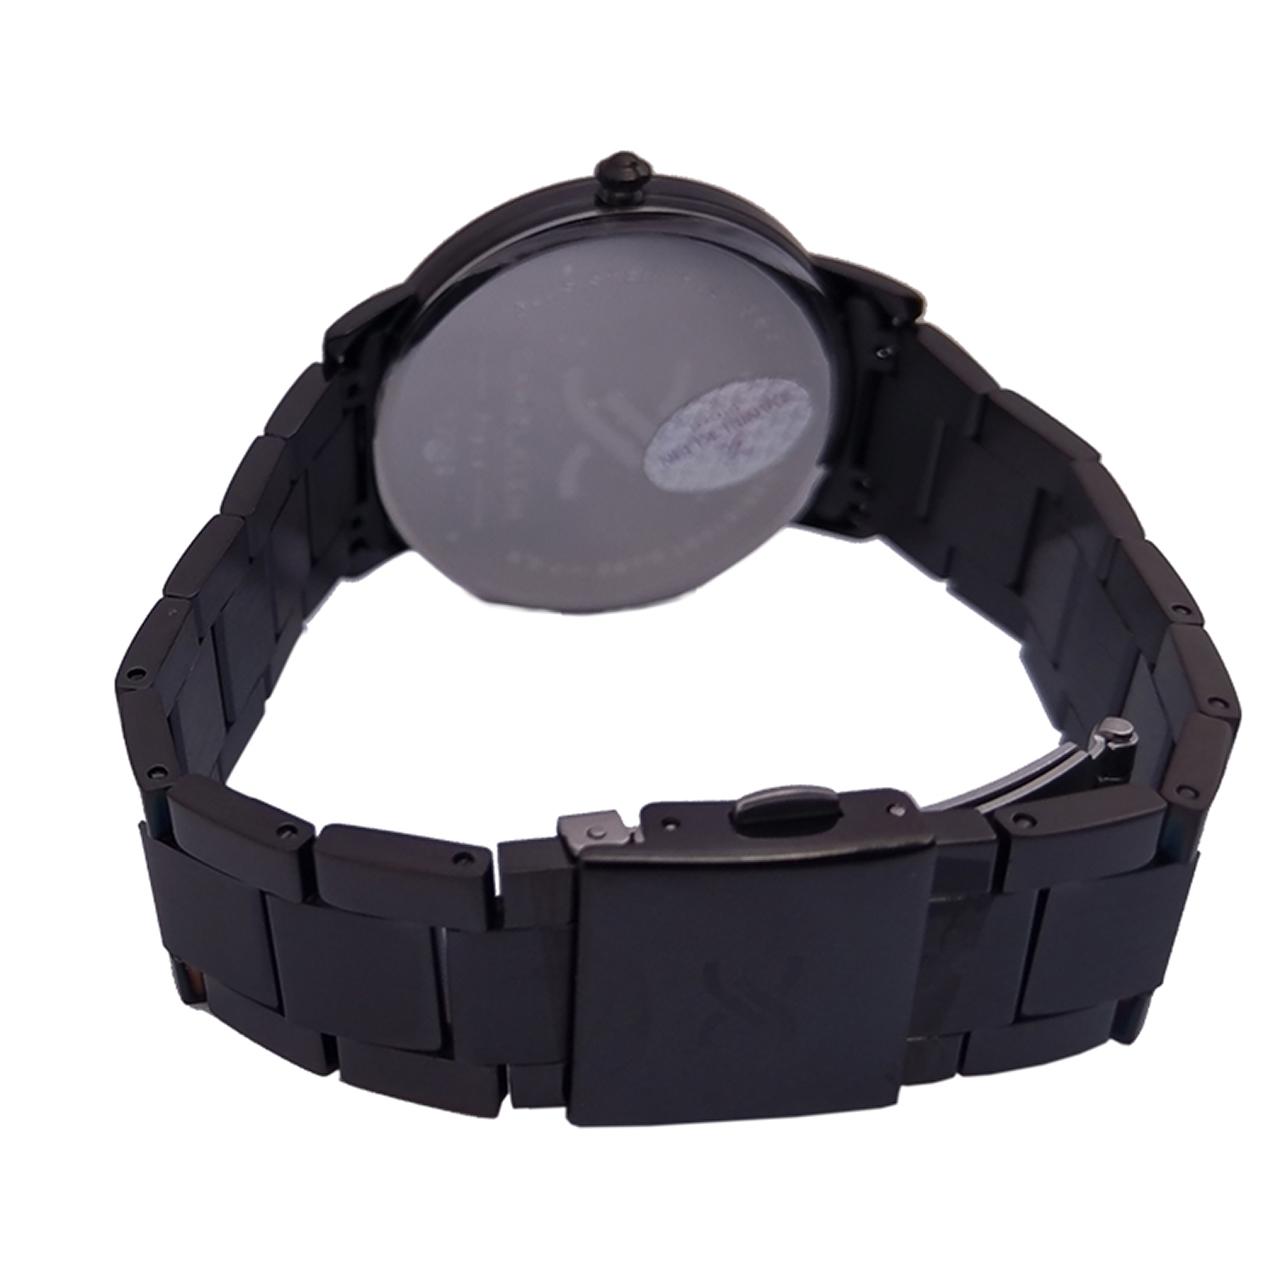 ساعت مچی عقربهای مردانه دنیل کلین مدل  Fiord DK12008-3